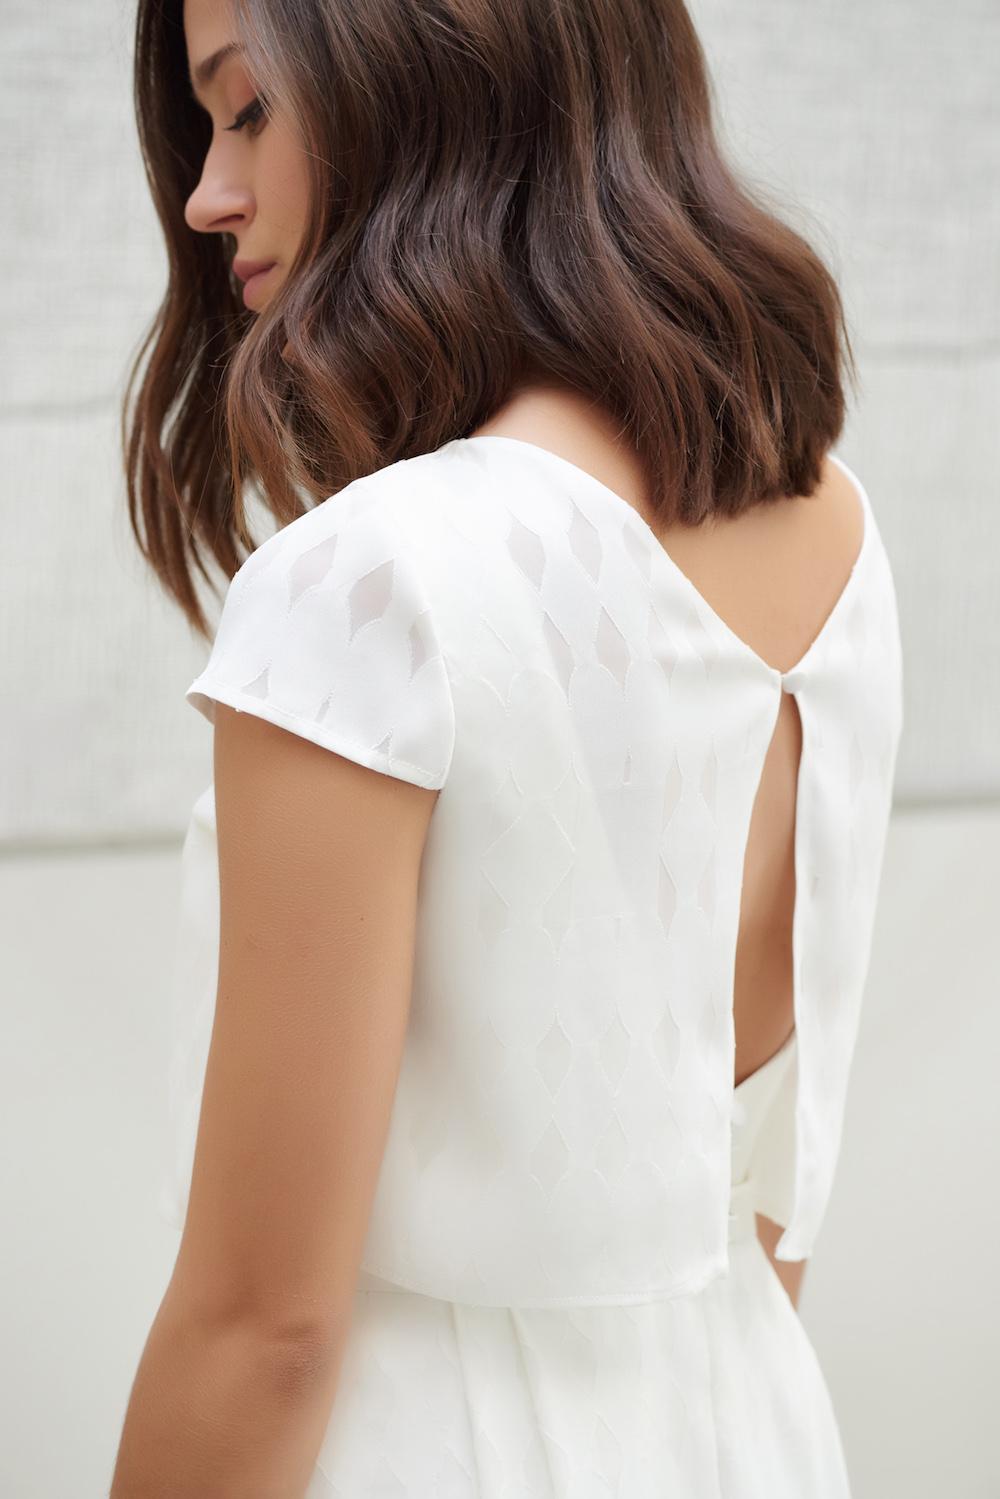 parisian-inspired-blog-mariagecamille-marguet-robe-mariée-paris-collection18-priam2-LD.jpg